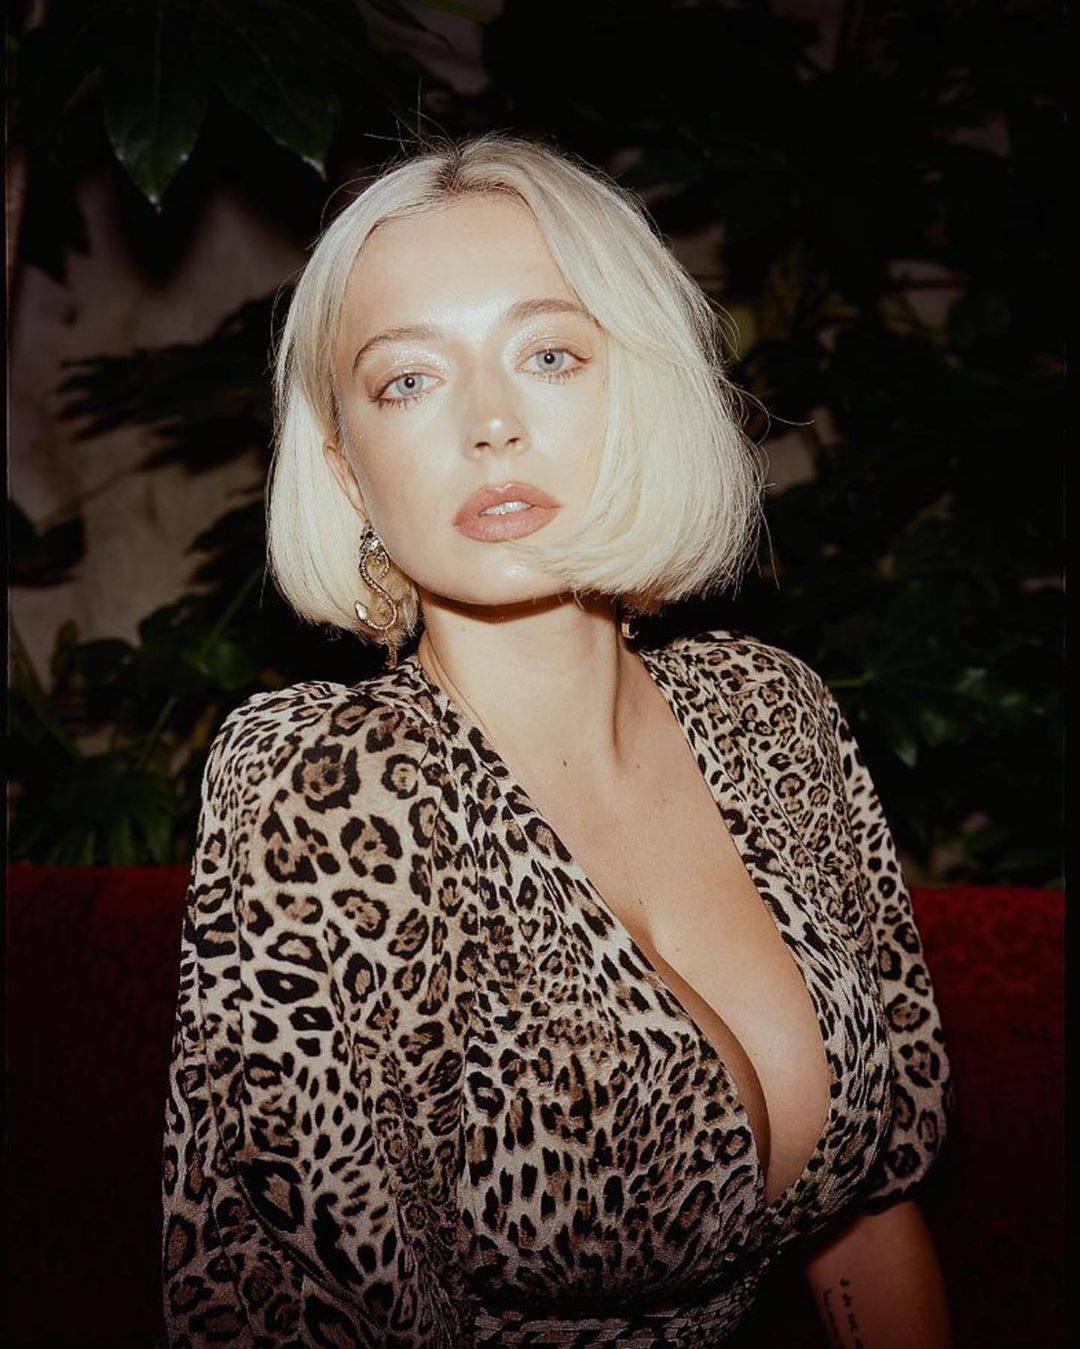 Caroline Vreeland – Sexy Big Boobs In Big Cleavage 0001